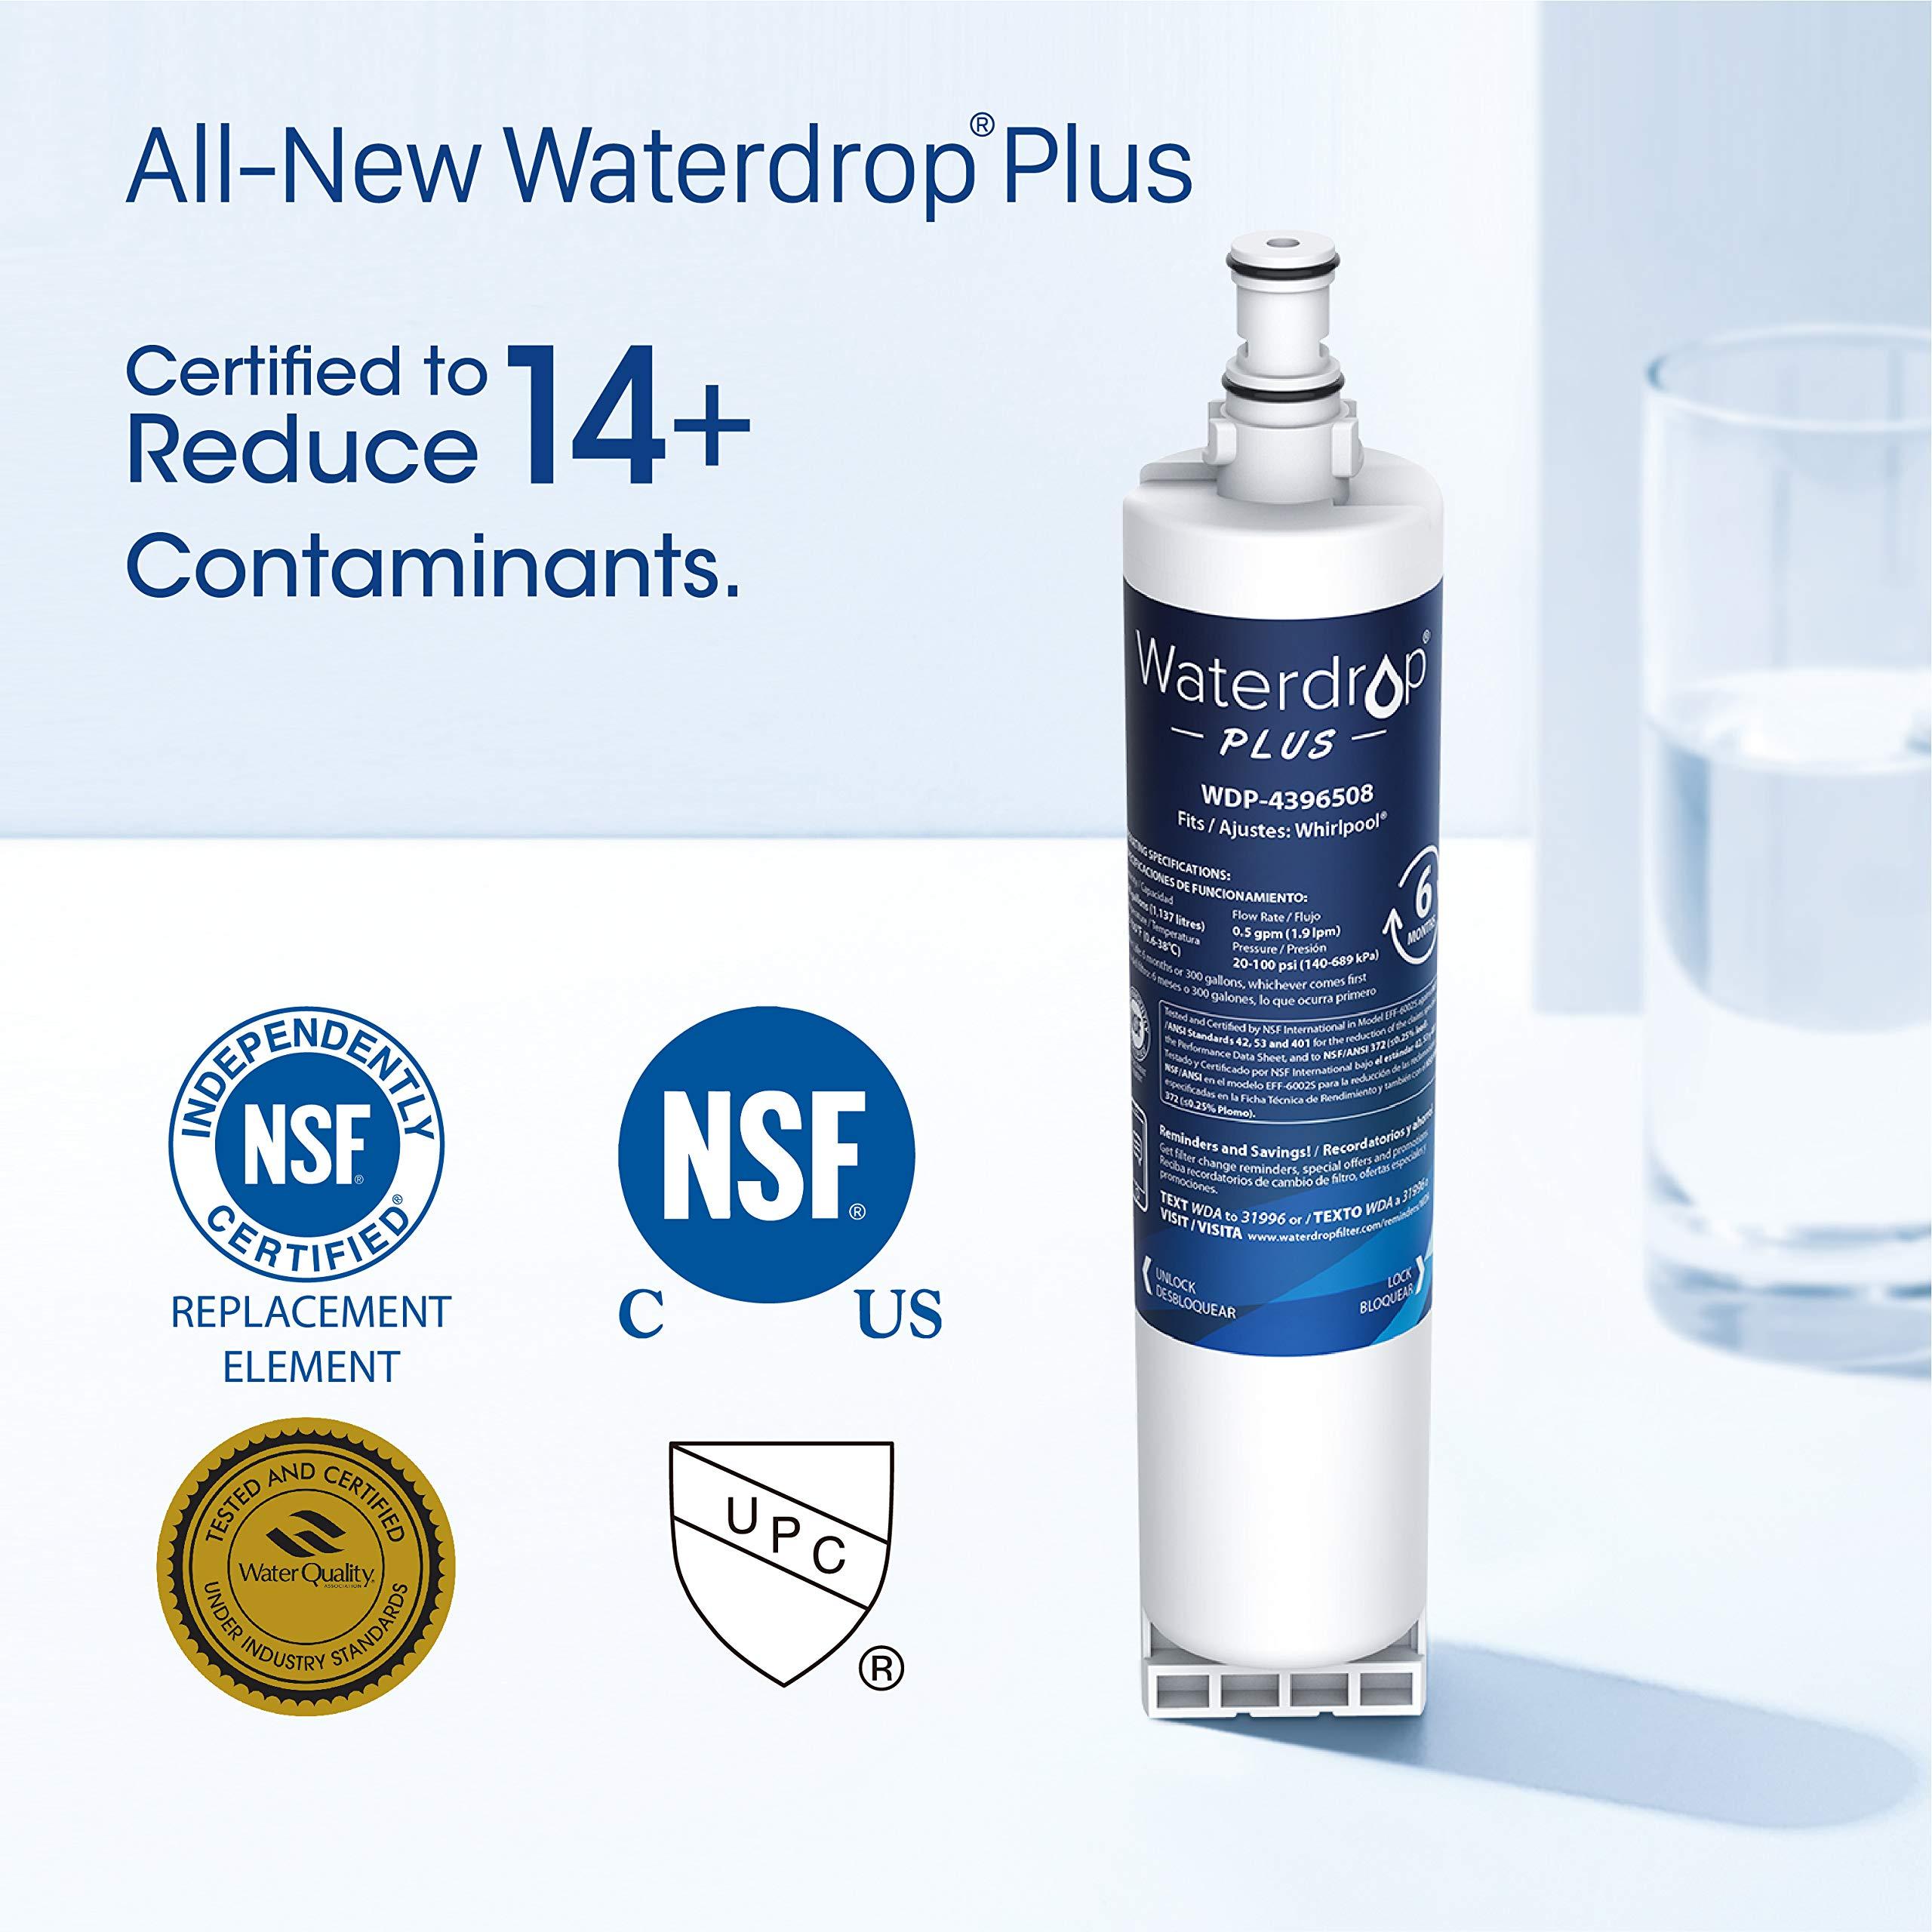 Waterdrop Plus 4396508 Refrigerator Water Filter